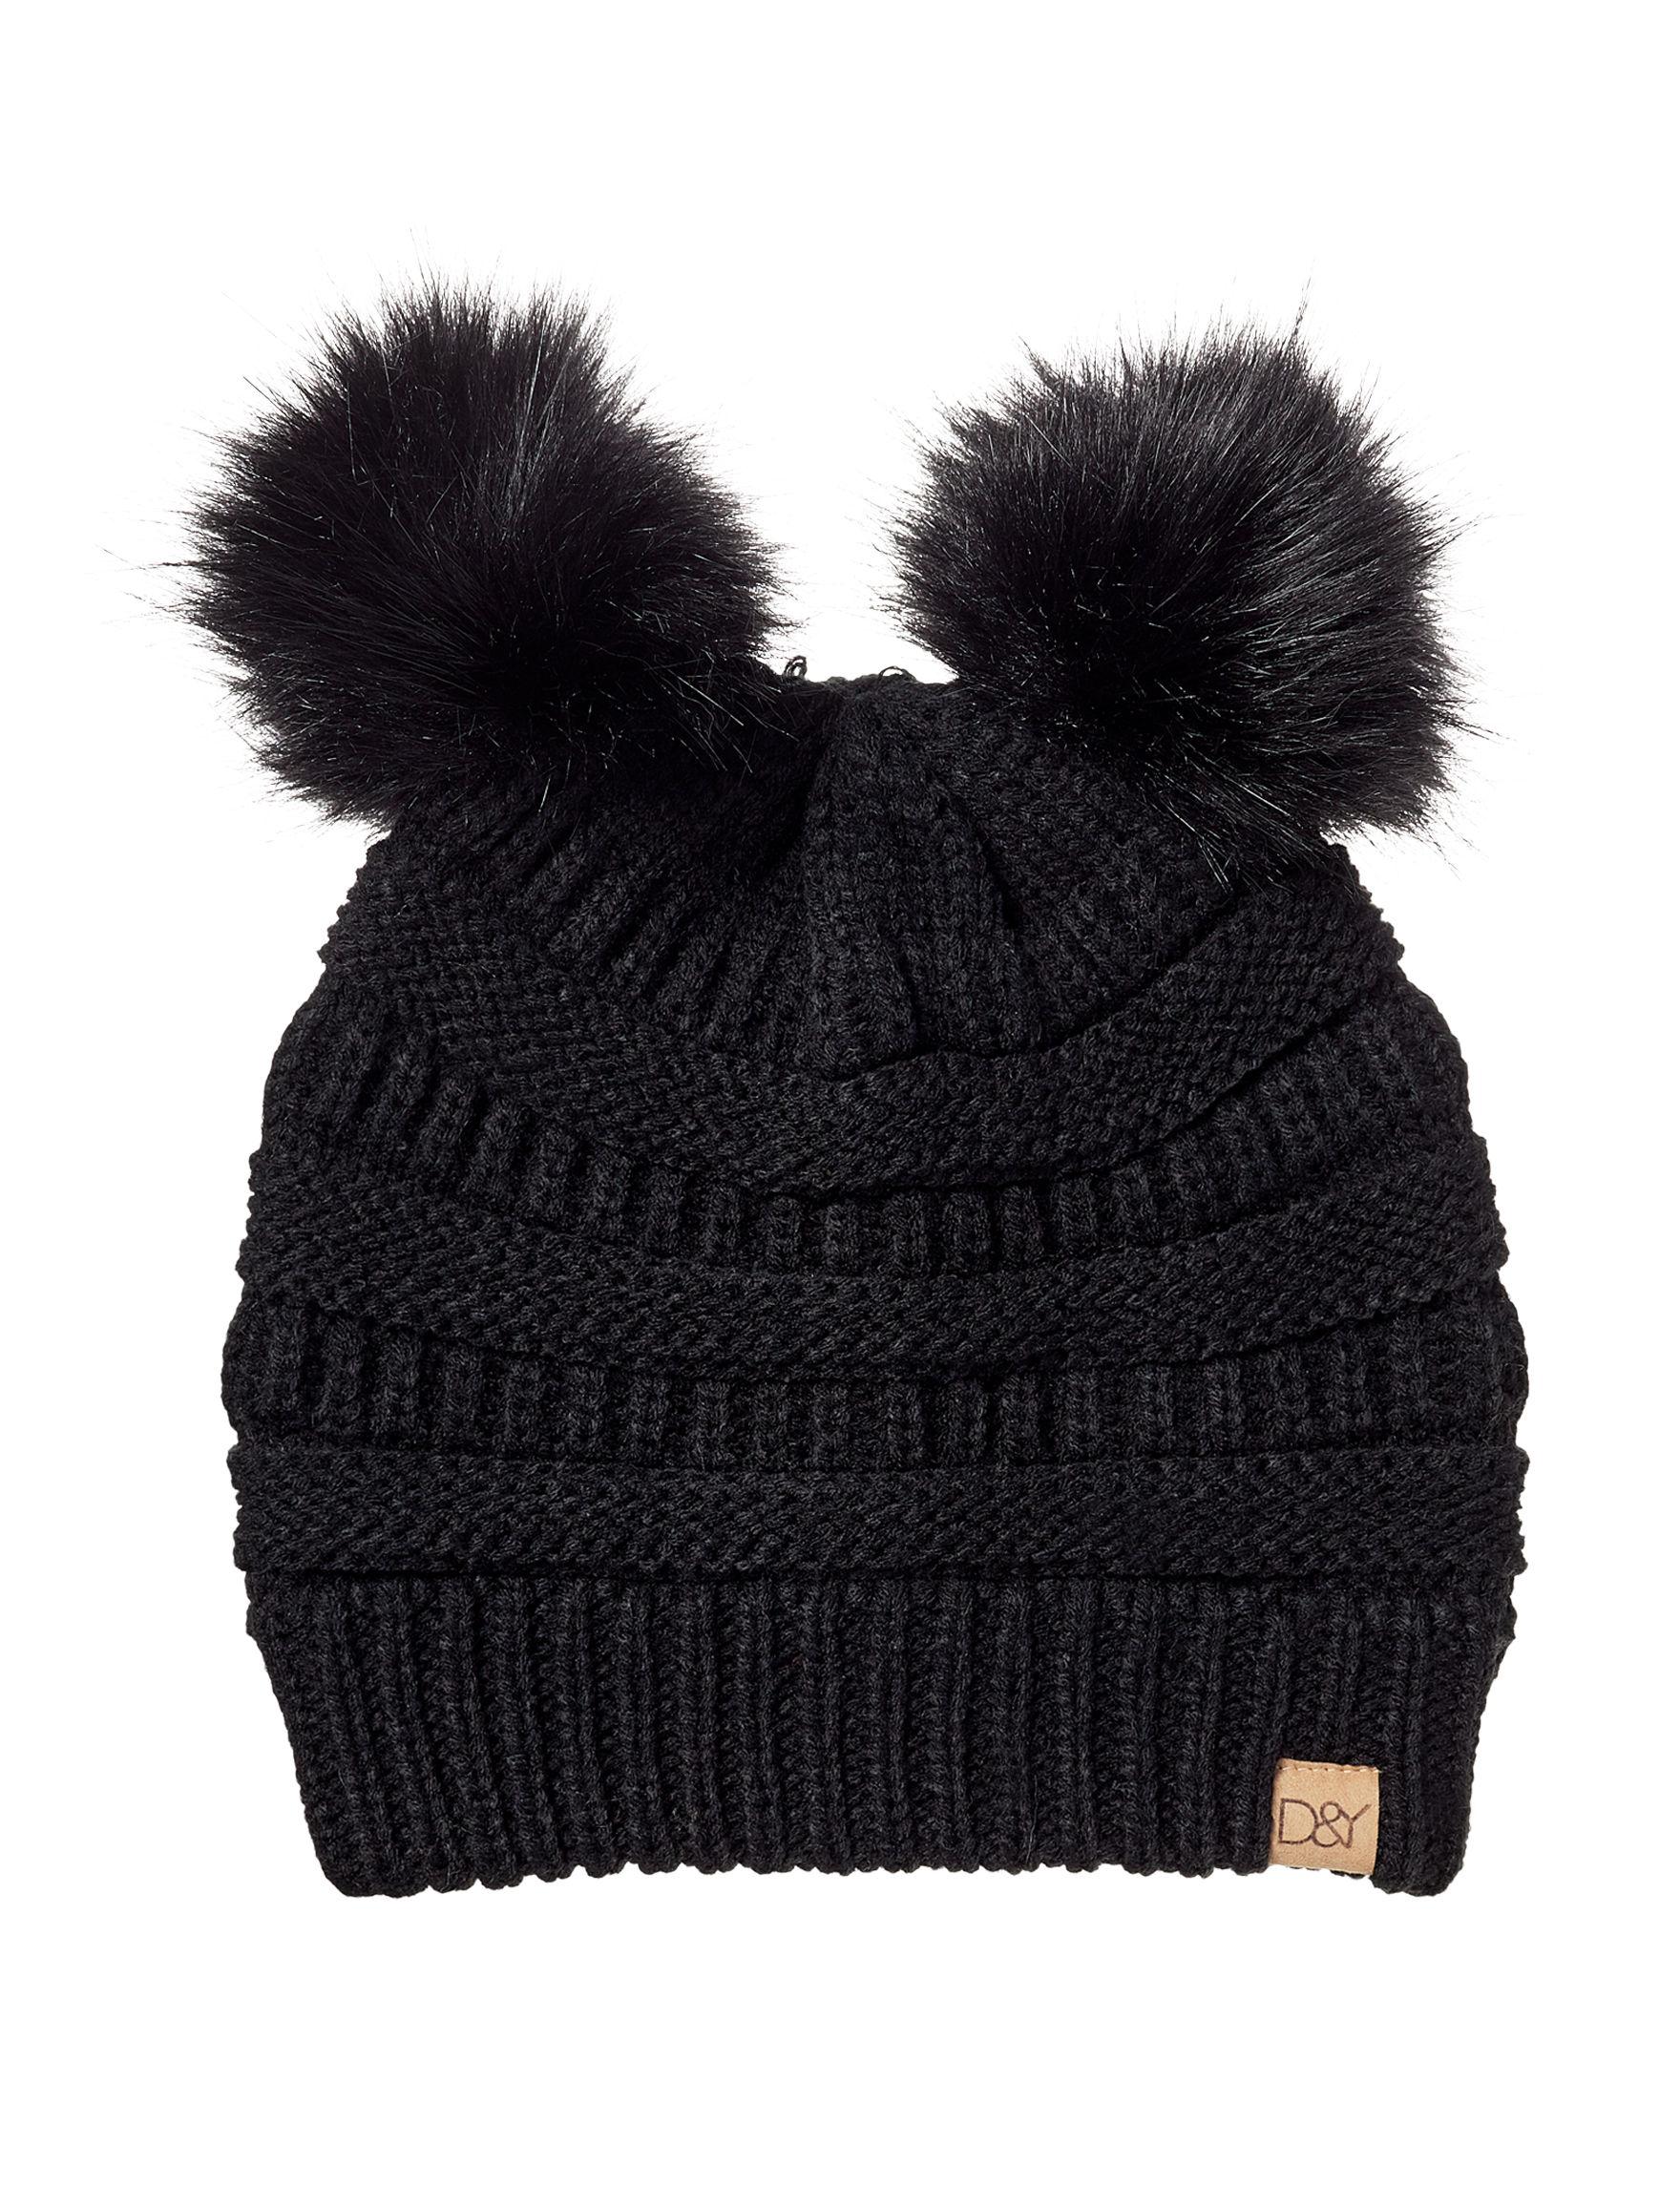 David & Young Black Hats & Headwear Beanies